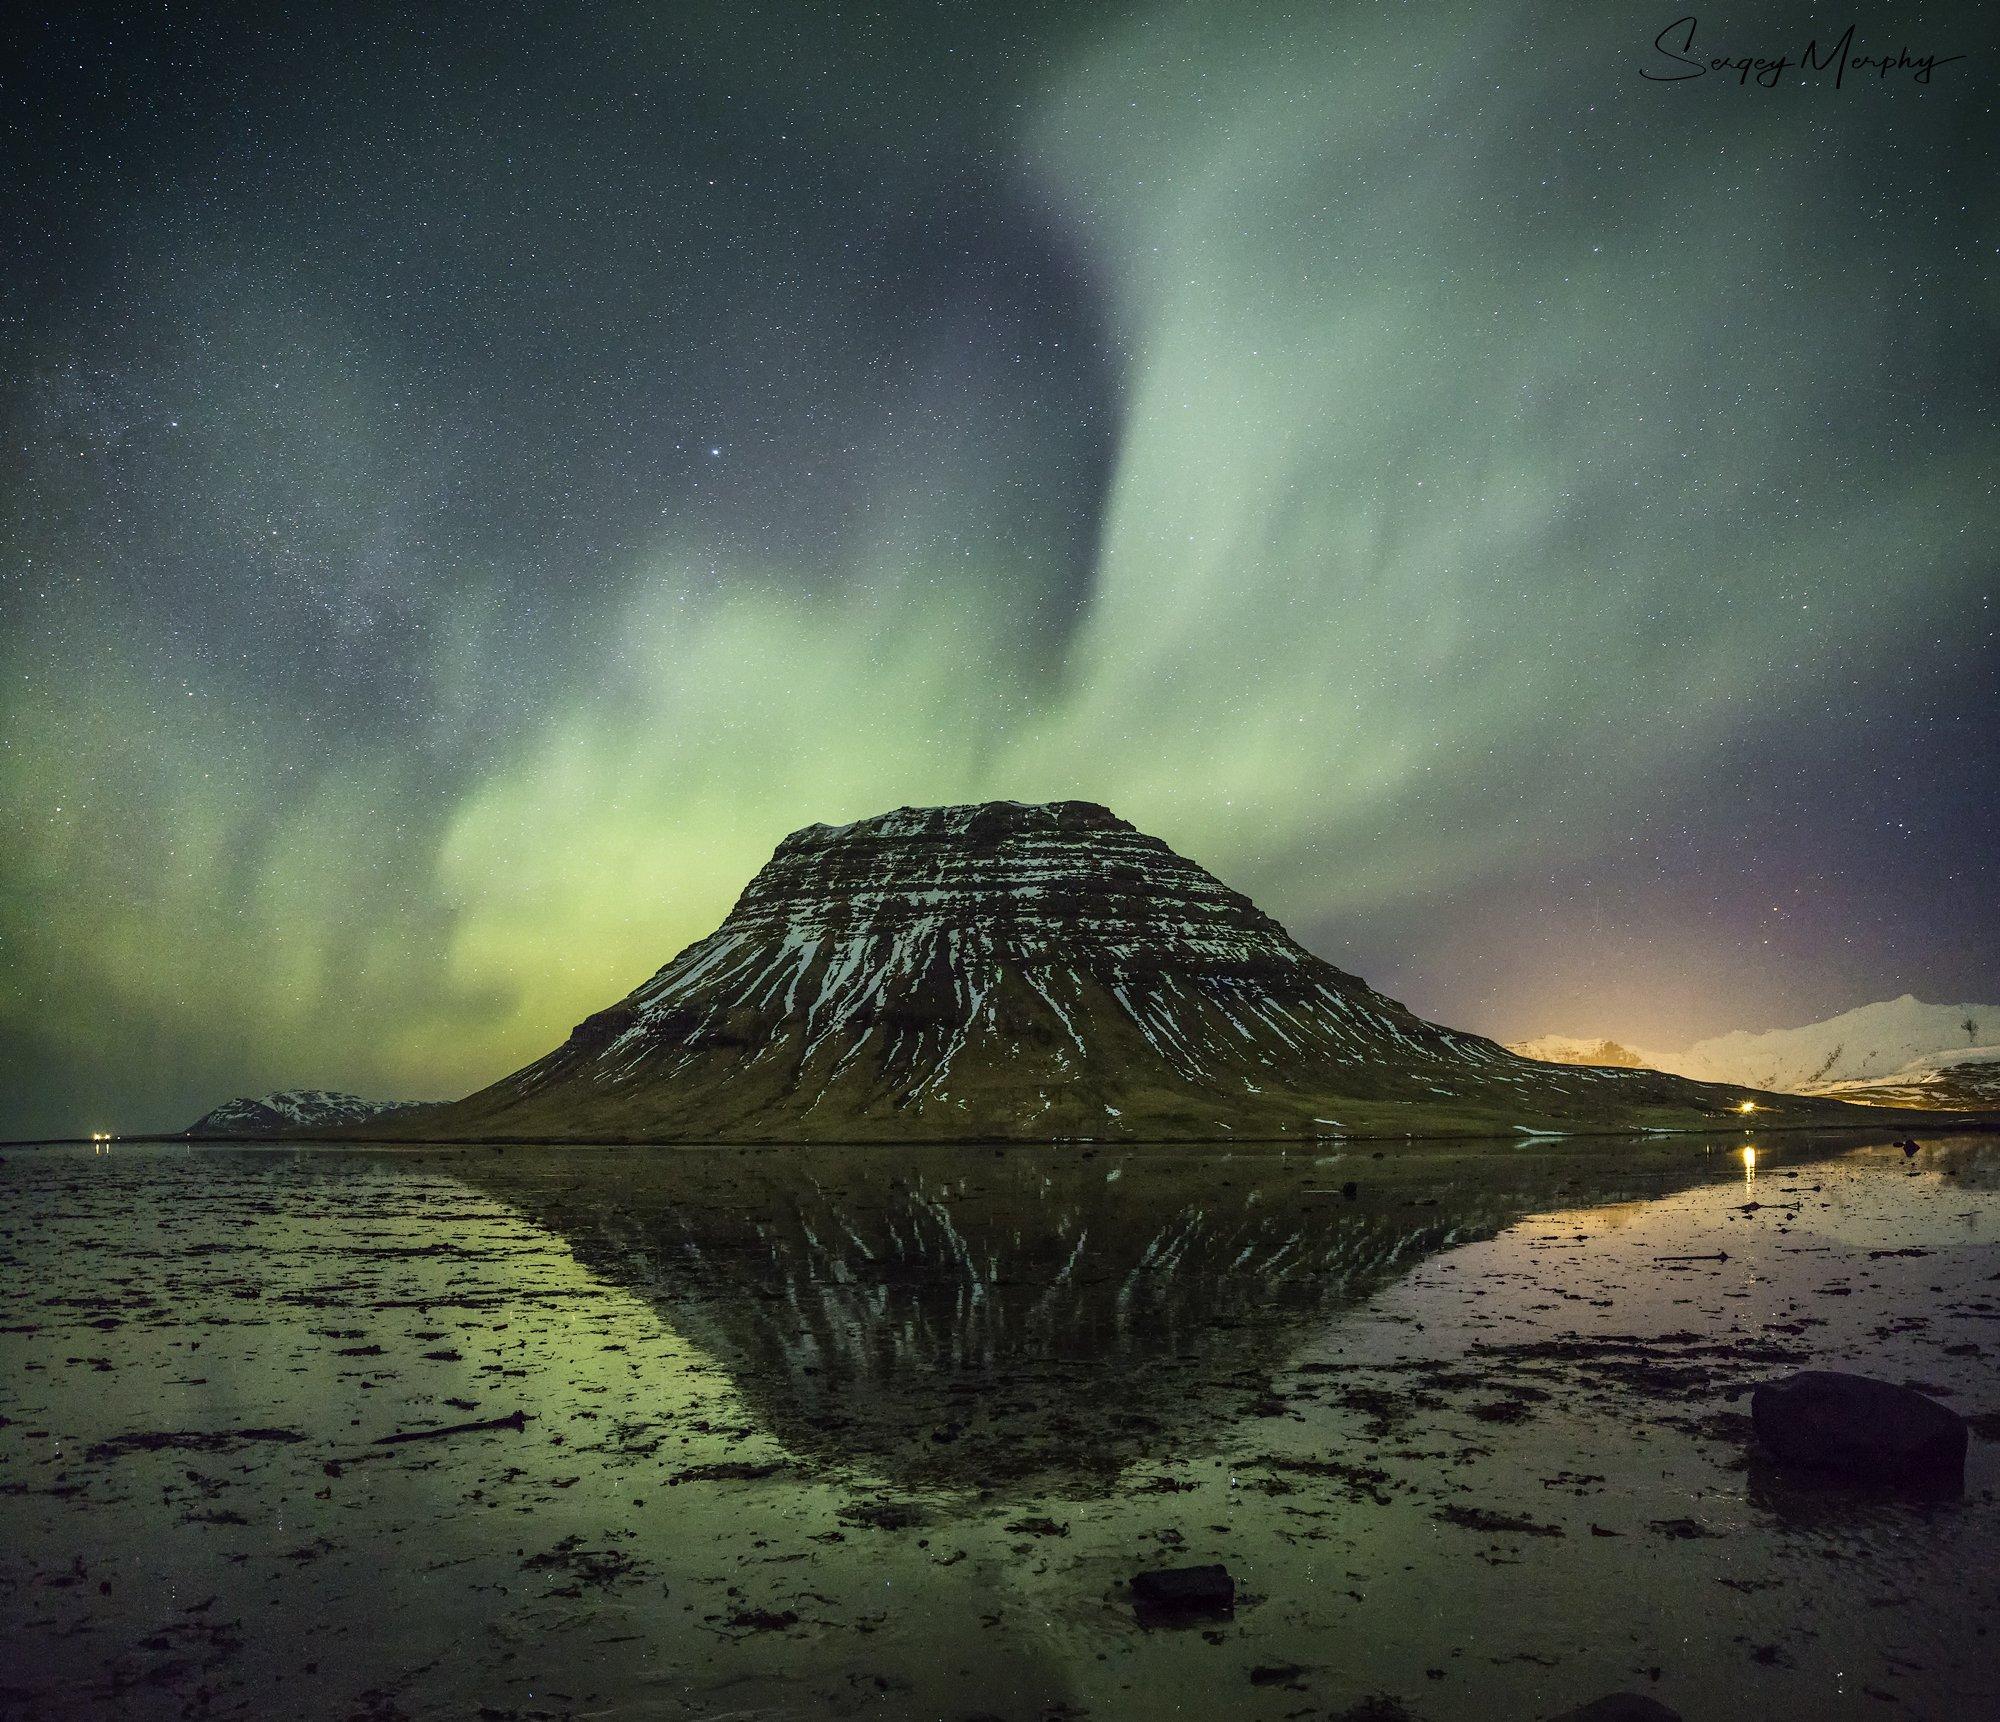 kirkjufell iceland northern lights, Sergey Merphy